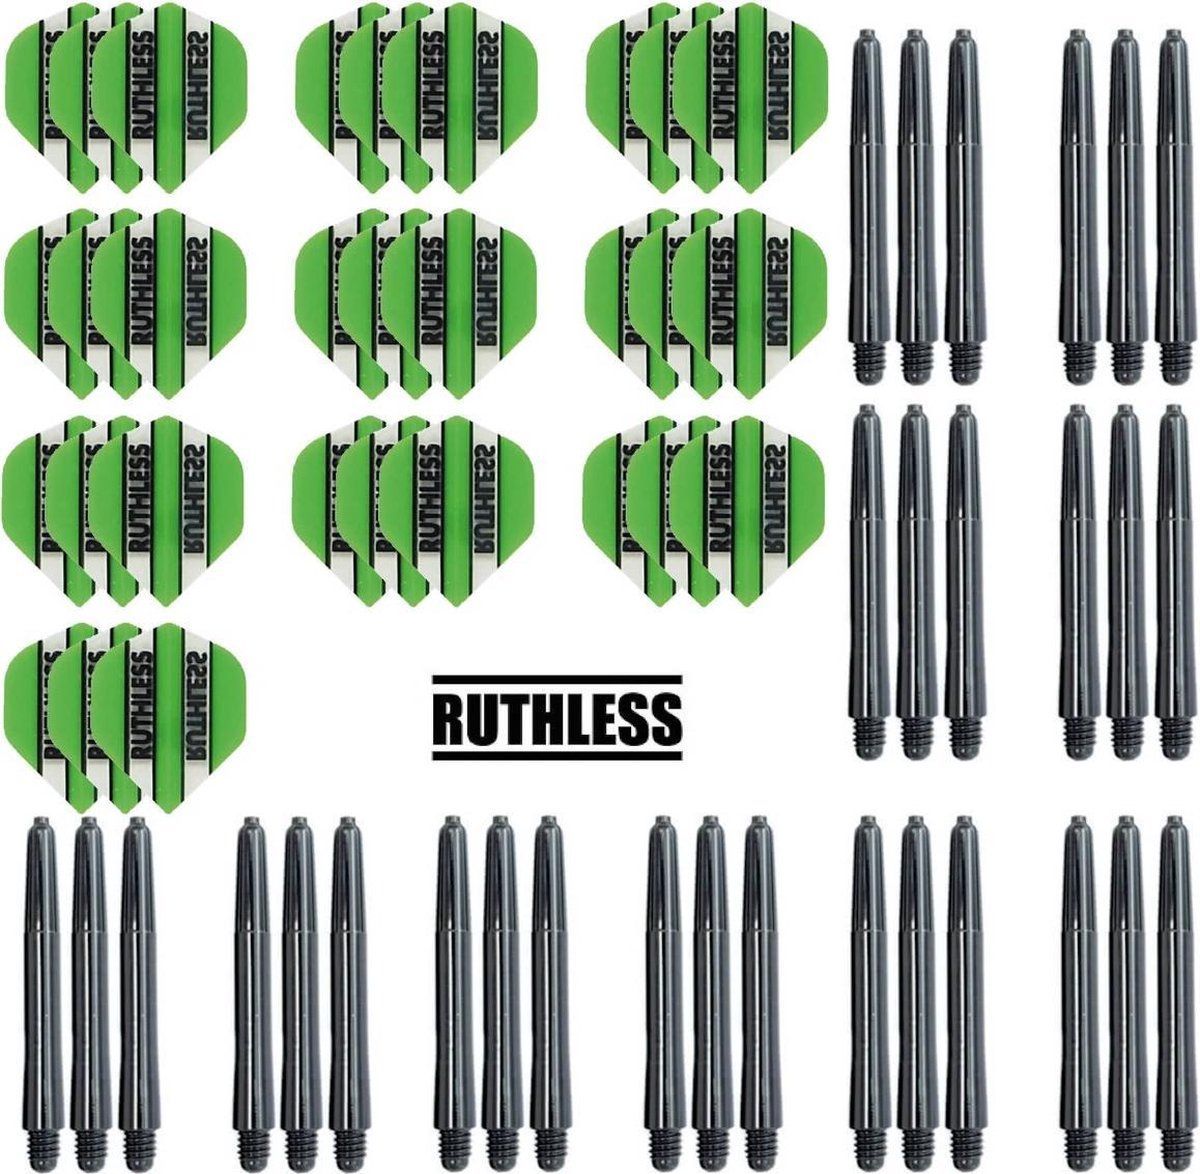 Dragon darts - 10 Sets Ruthless Flights - darts flights - Groen - plus 10 sets Dragon - darts shafts - medium